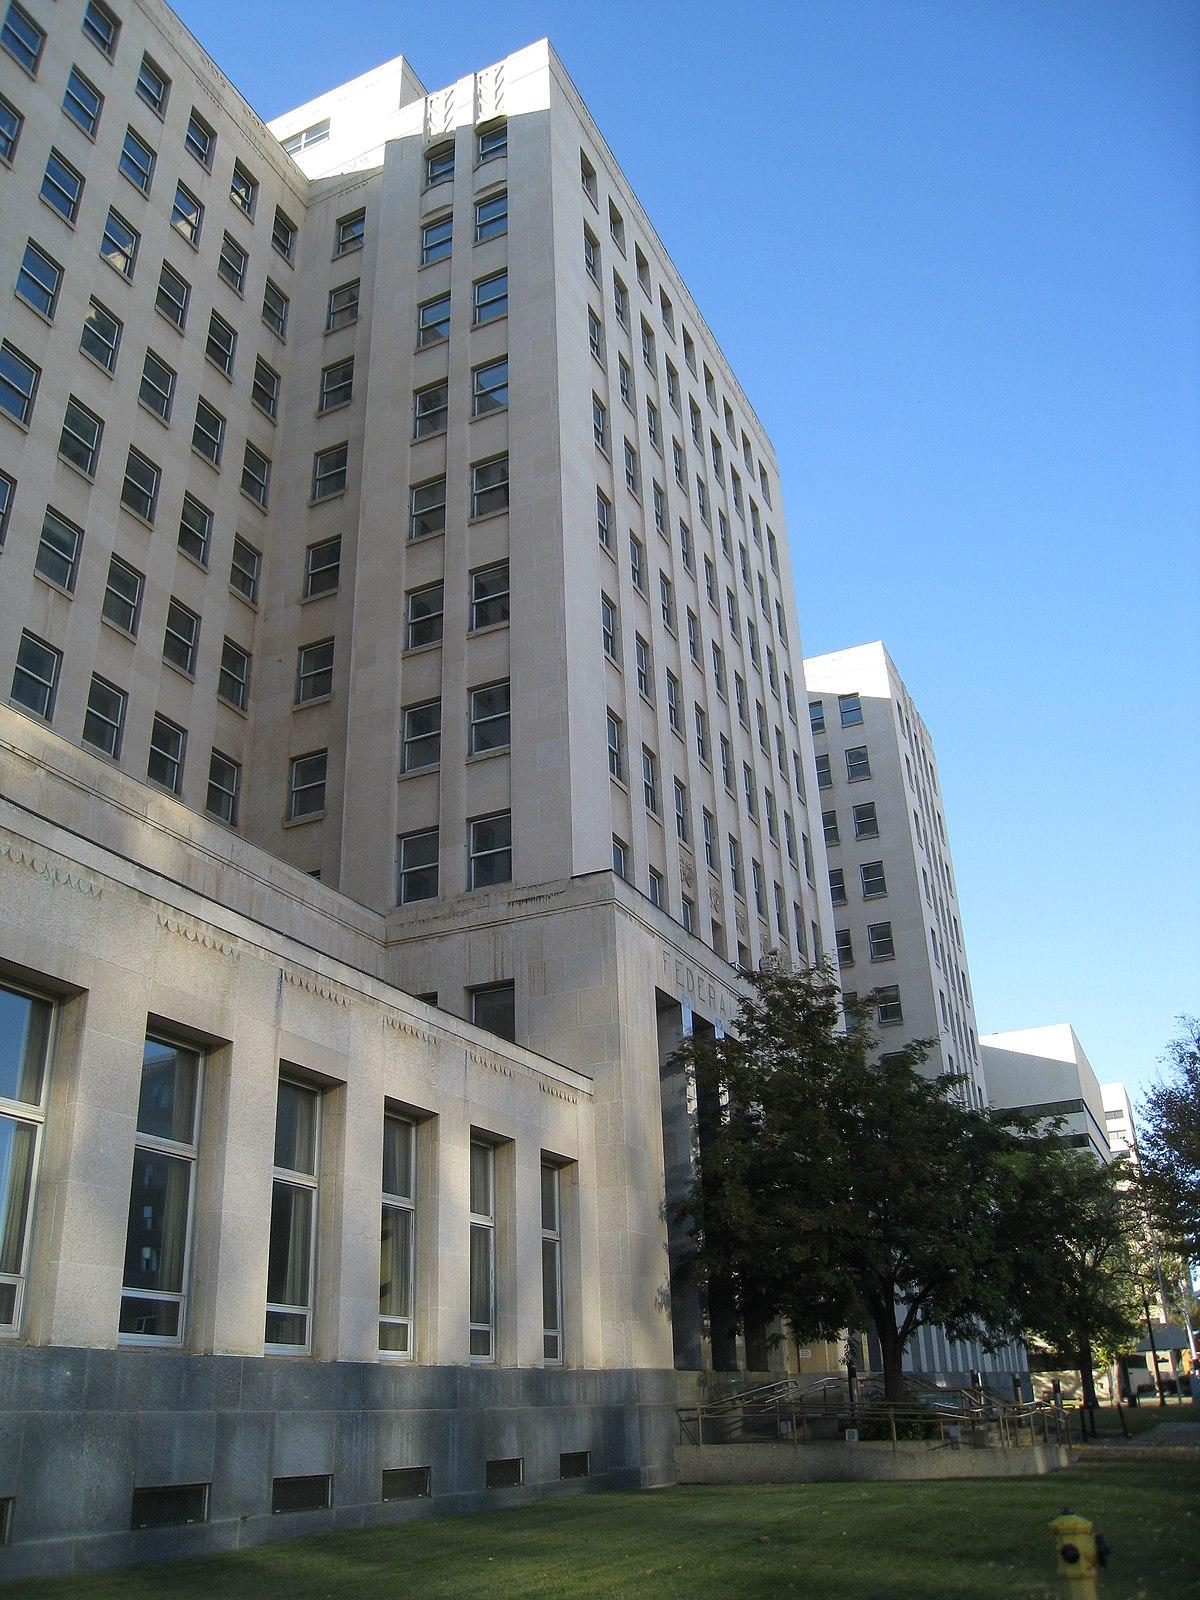 Federal Building, Edmonton - Wikipedia